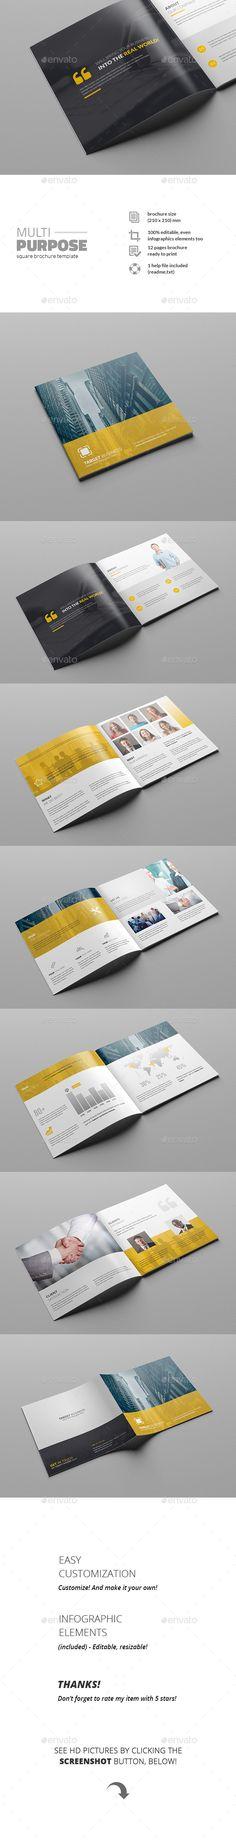 Multipurpose Square Brochure Template #design Download: http://graphicriver.net/item/multipurpose-square-brochure/11641822?ref=ksioks